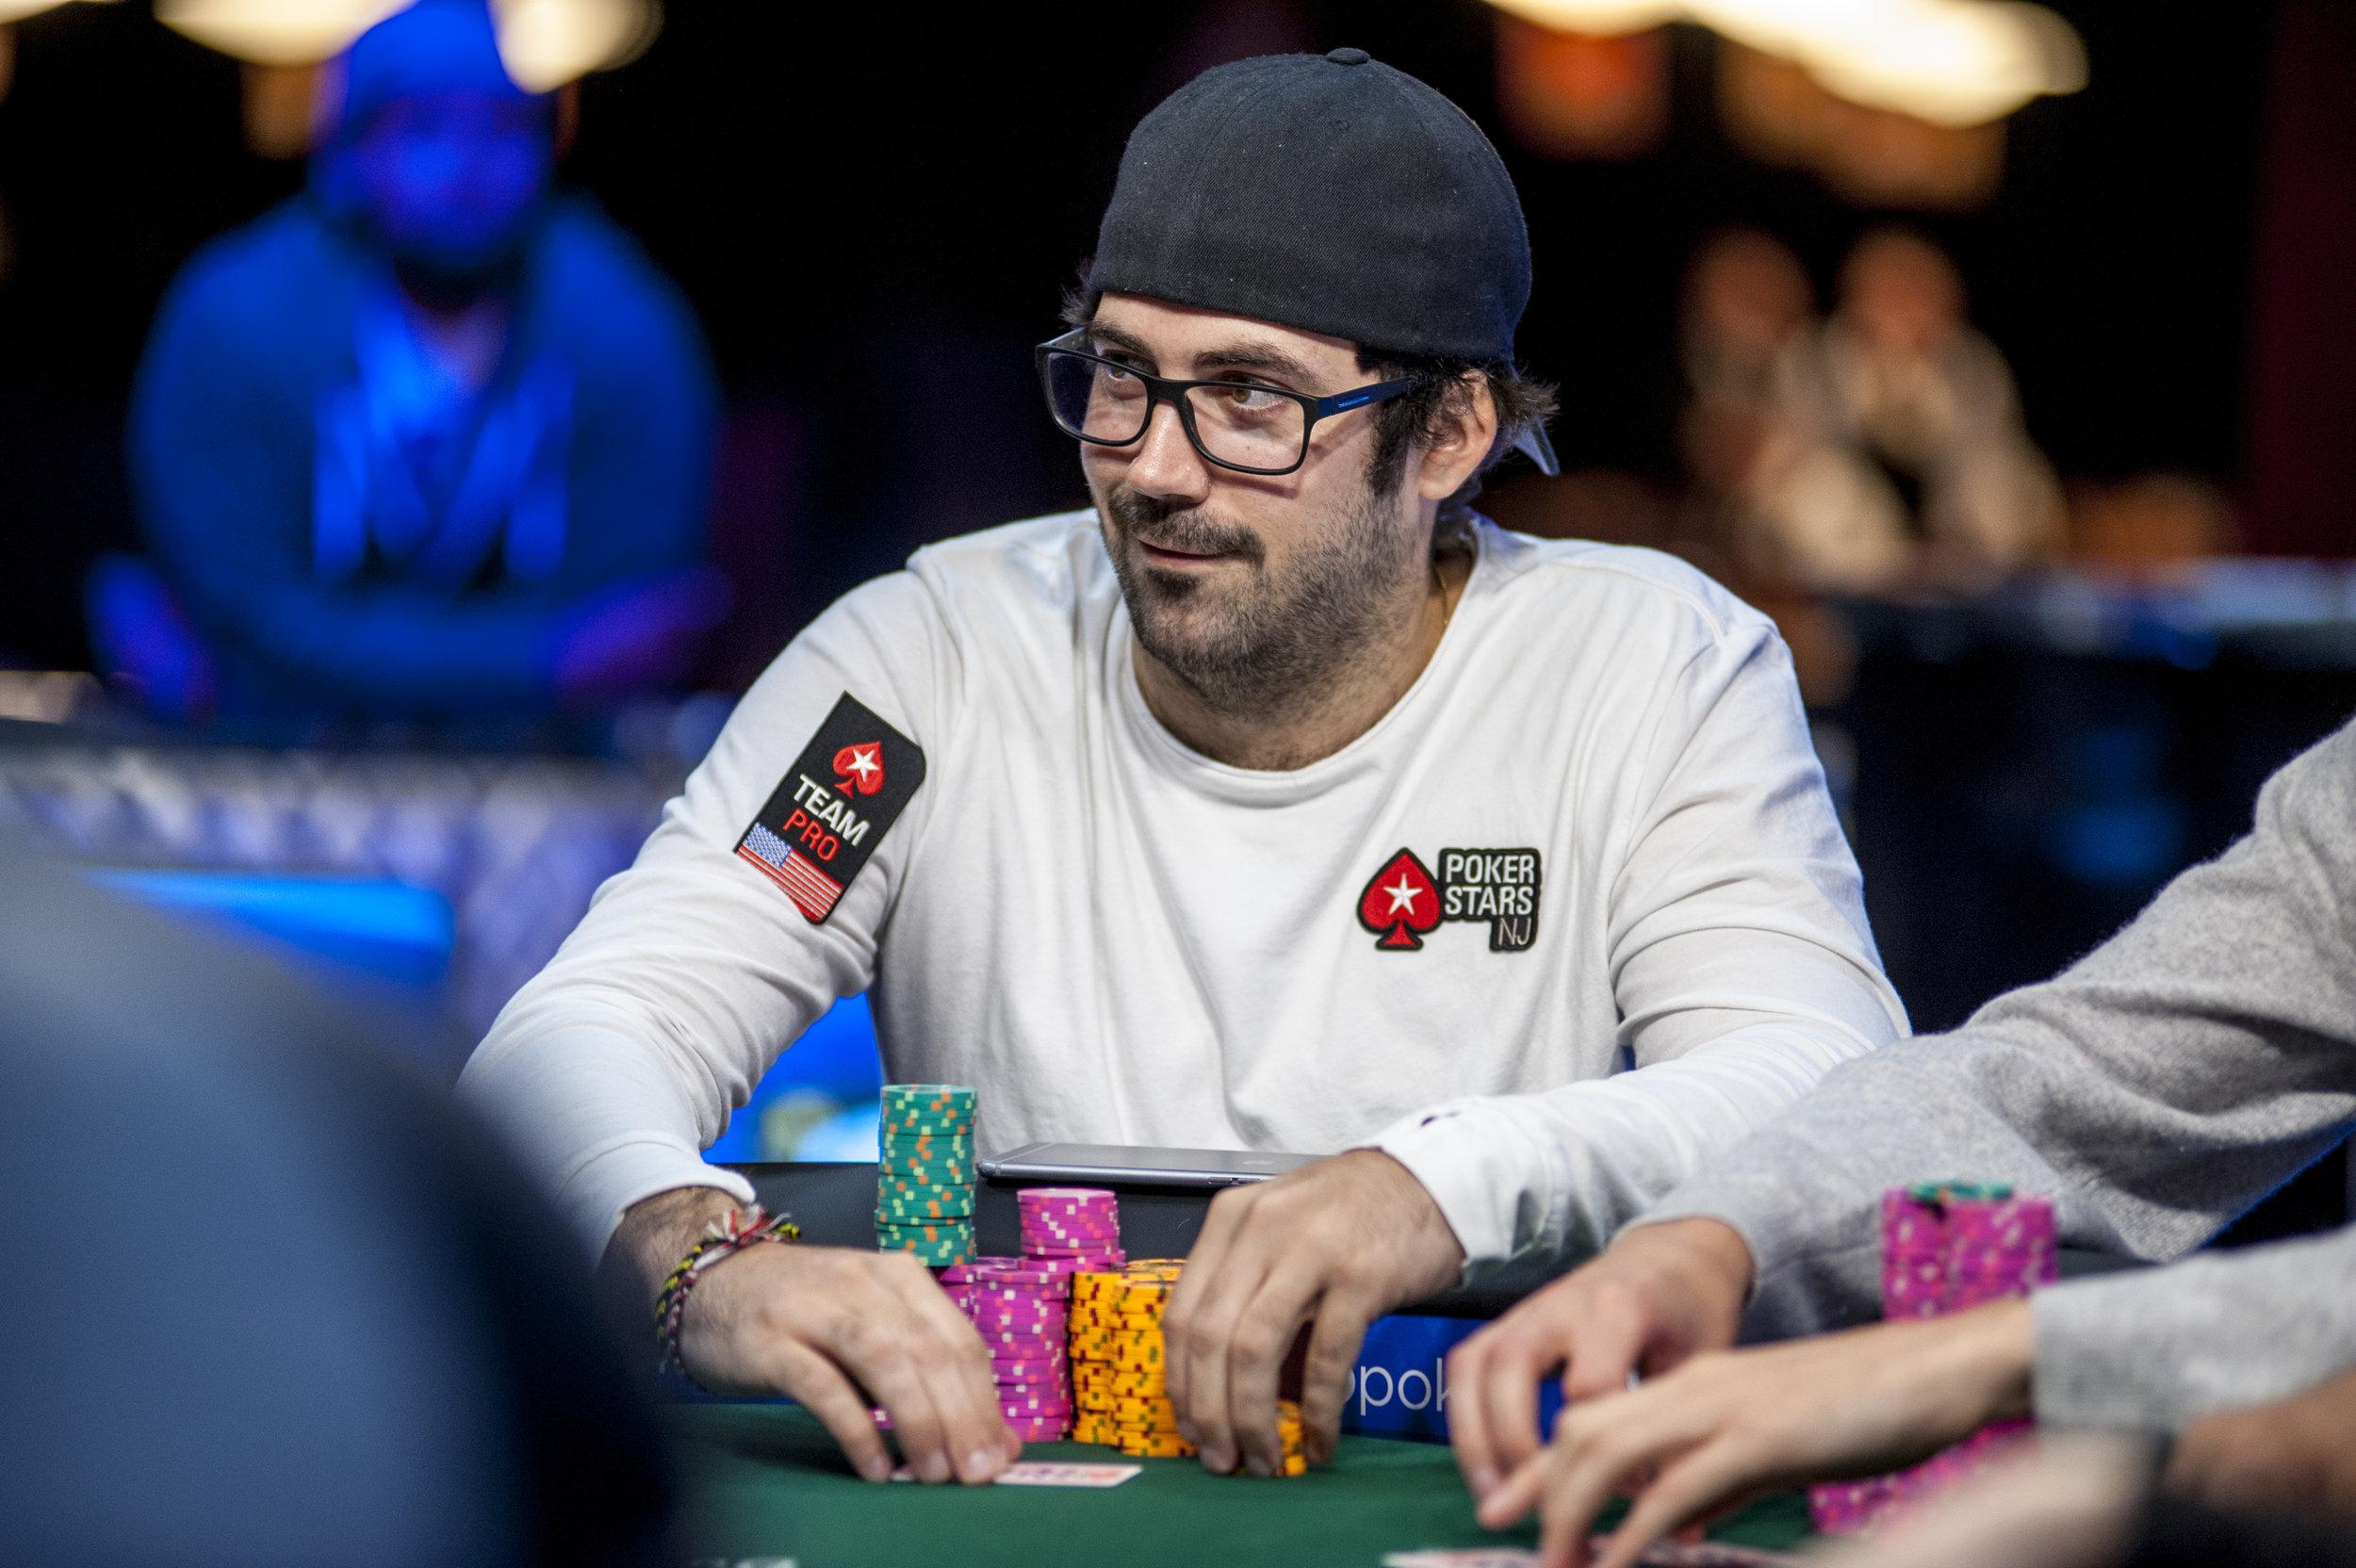 Jason Mercier_2016 World Series of Poker_EV16_Day3_Amato_7DA2033.jpg